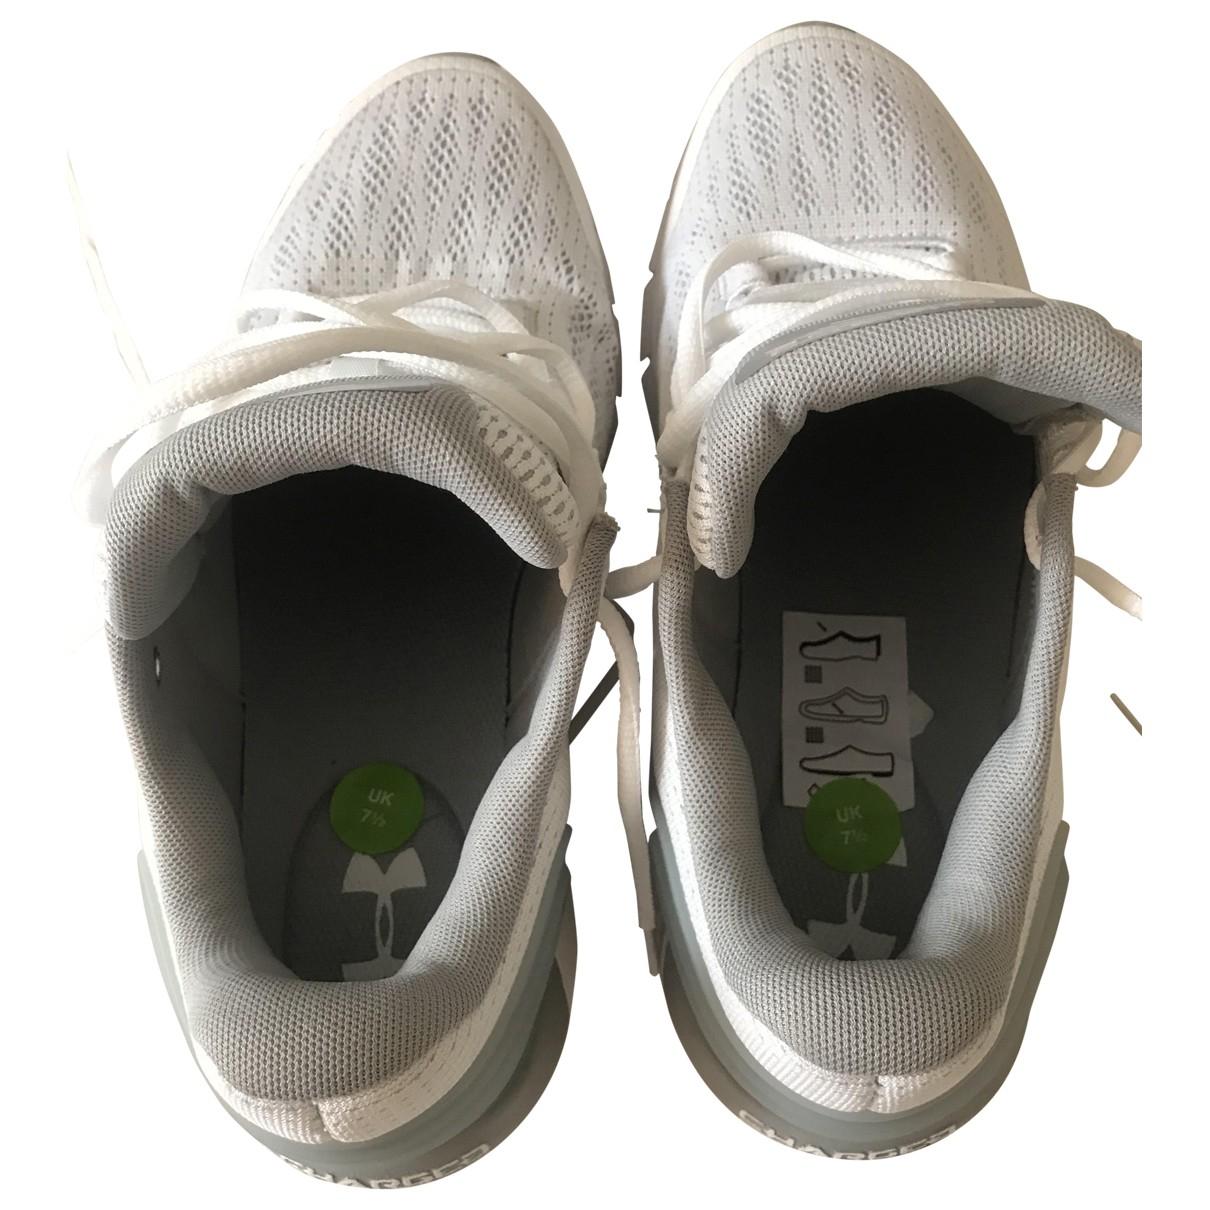 Under Armour \N Sneakers in  Weiss Leinen